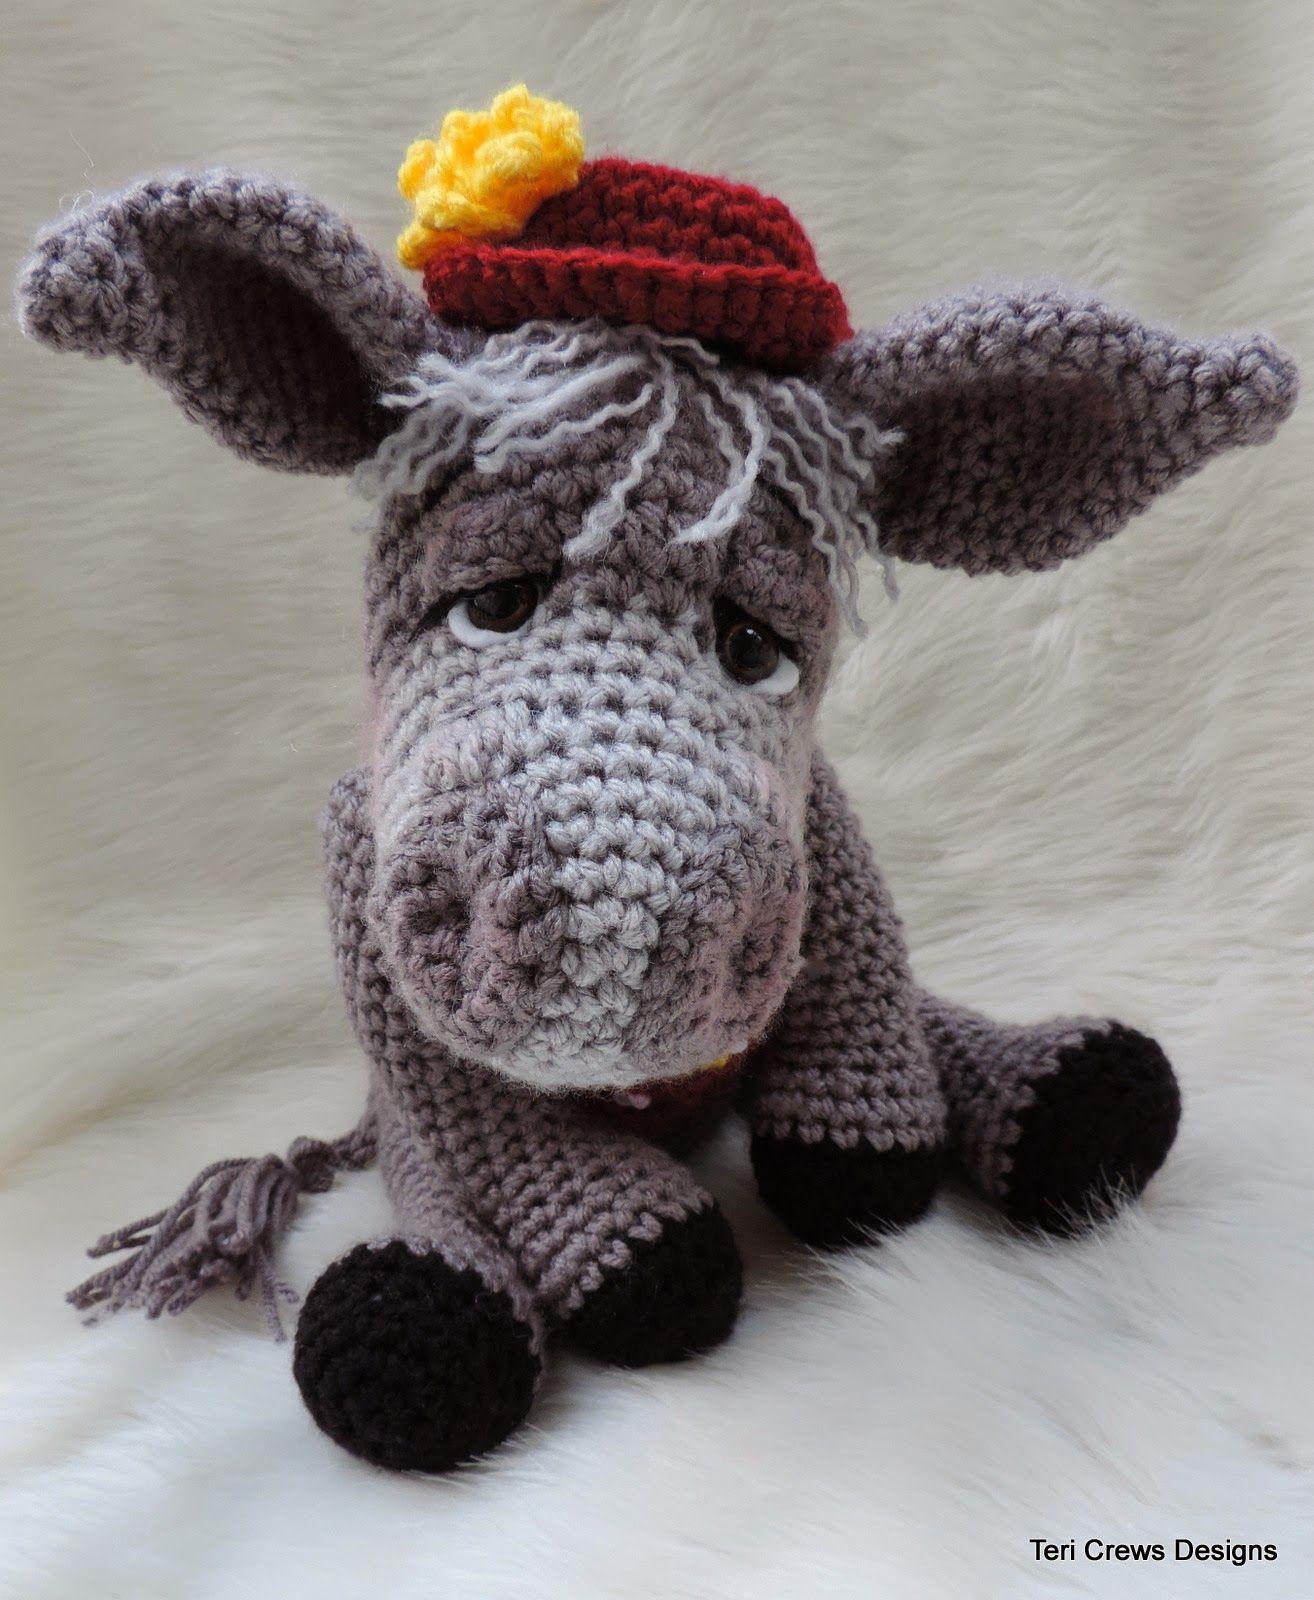 New Donkey Crochet Pattern  60d304141